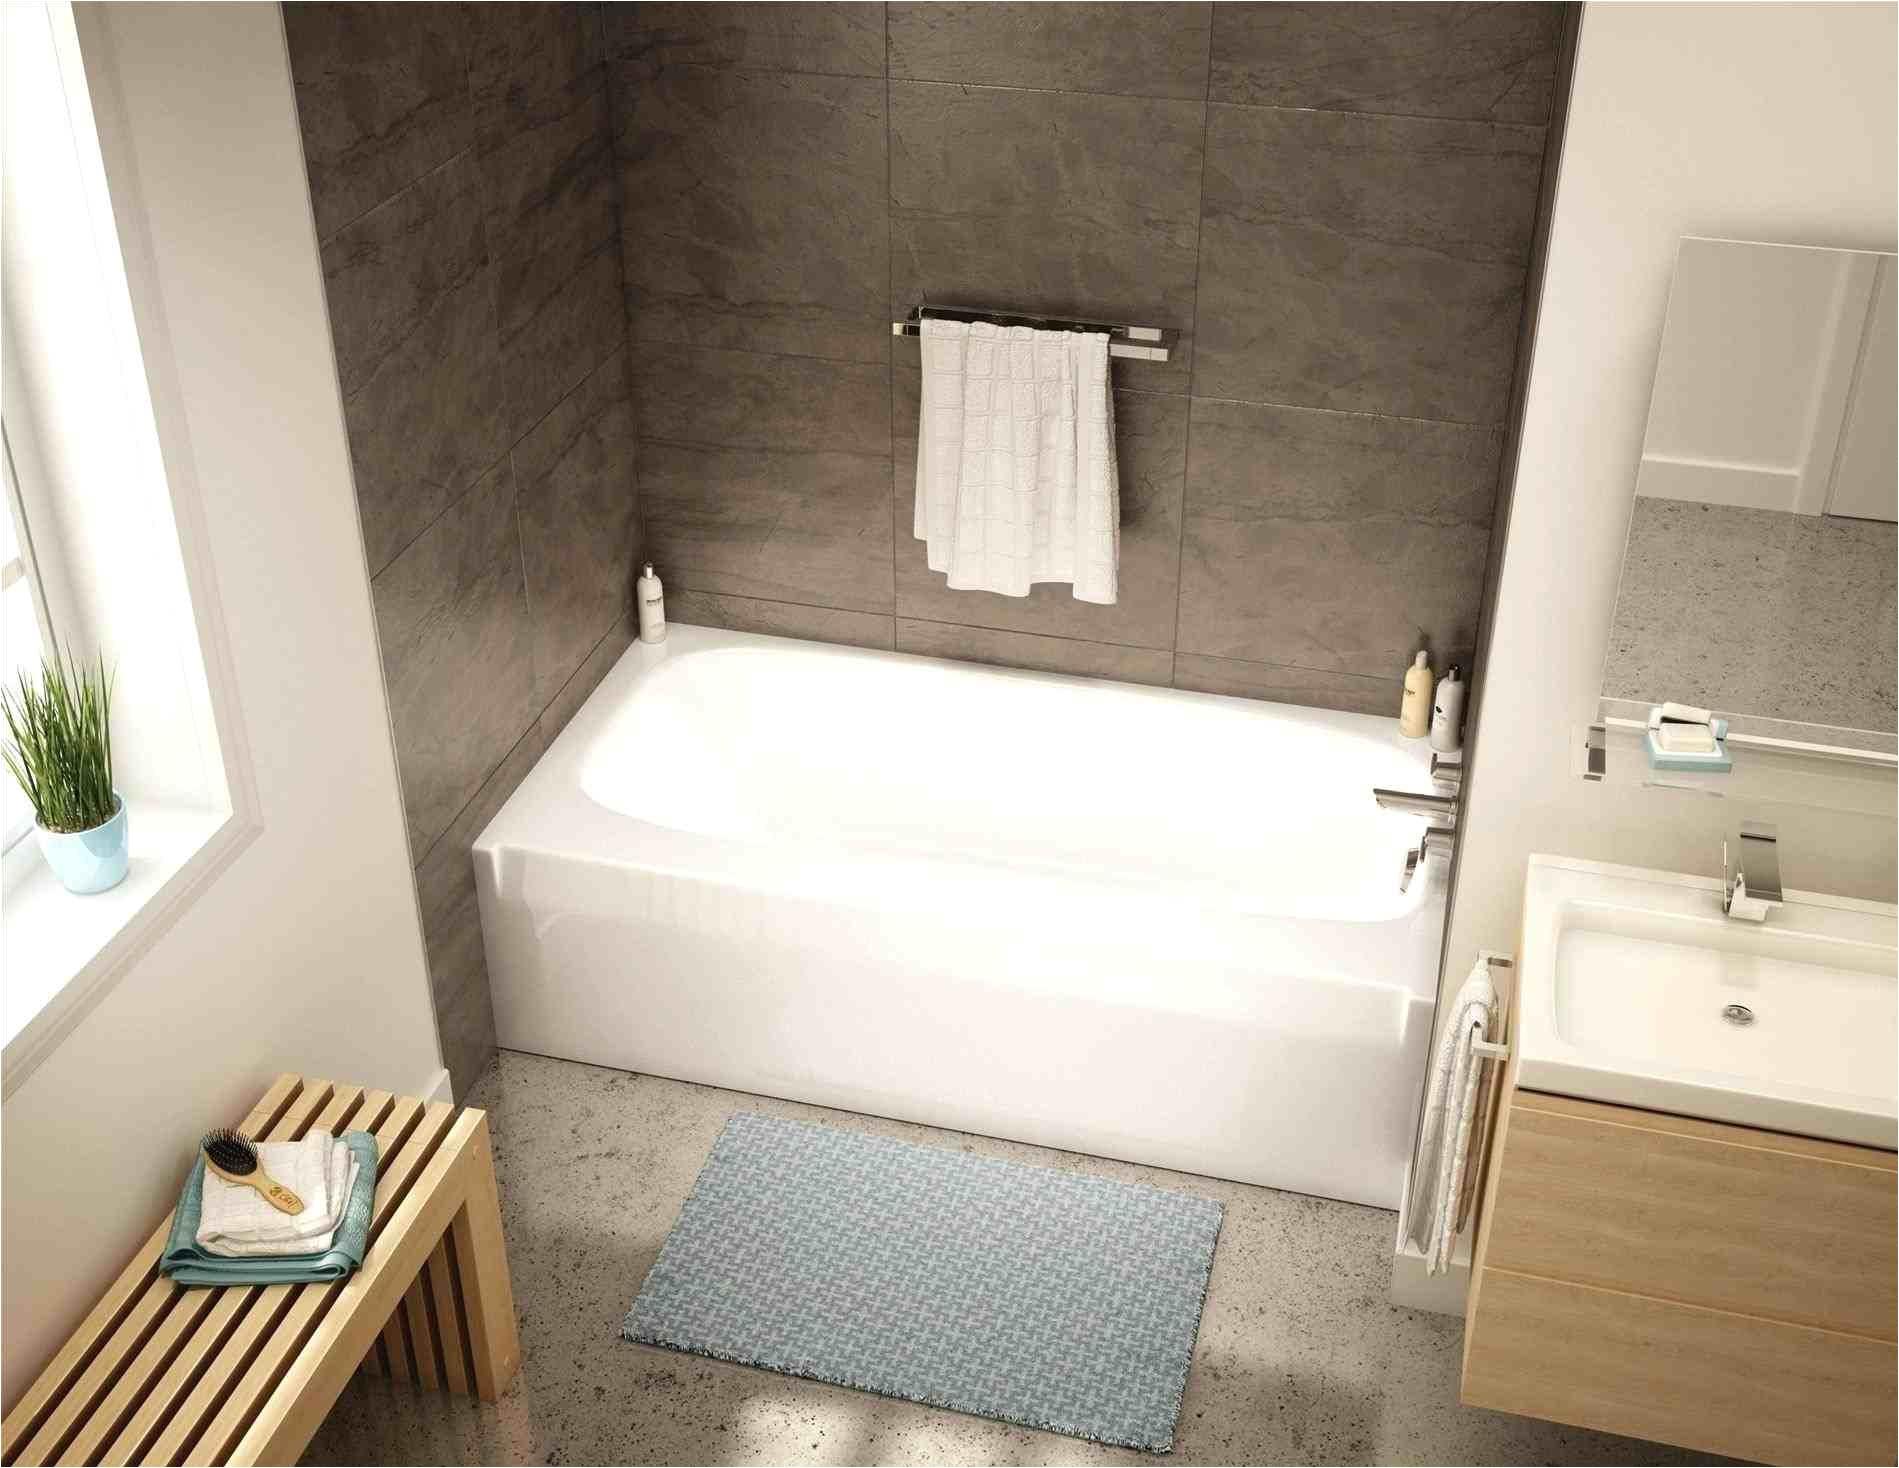 home depot tub surround shower bo rhhaushaltshilfepoleninfo canada ideasrhperspectiveswe canada 54 x 27 bathtub home depot